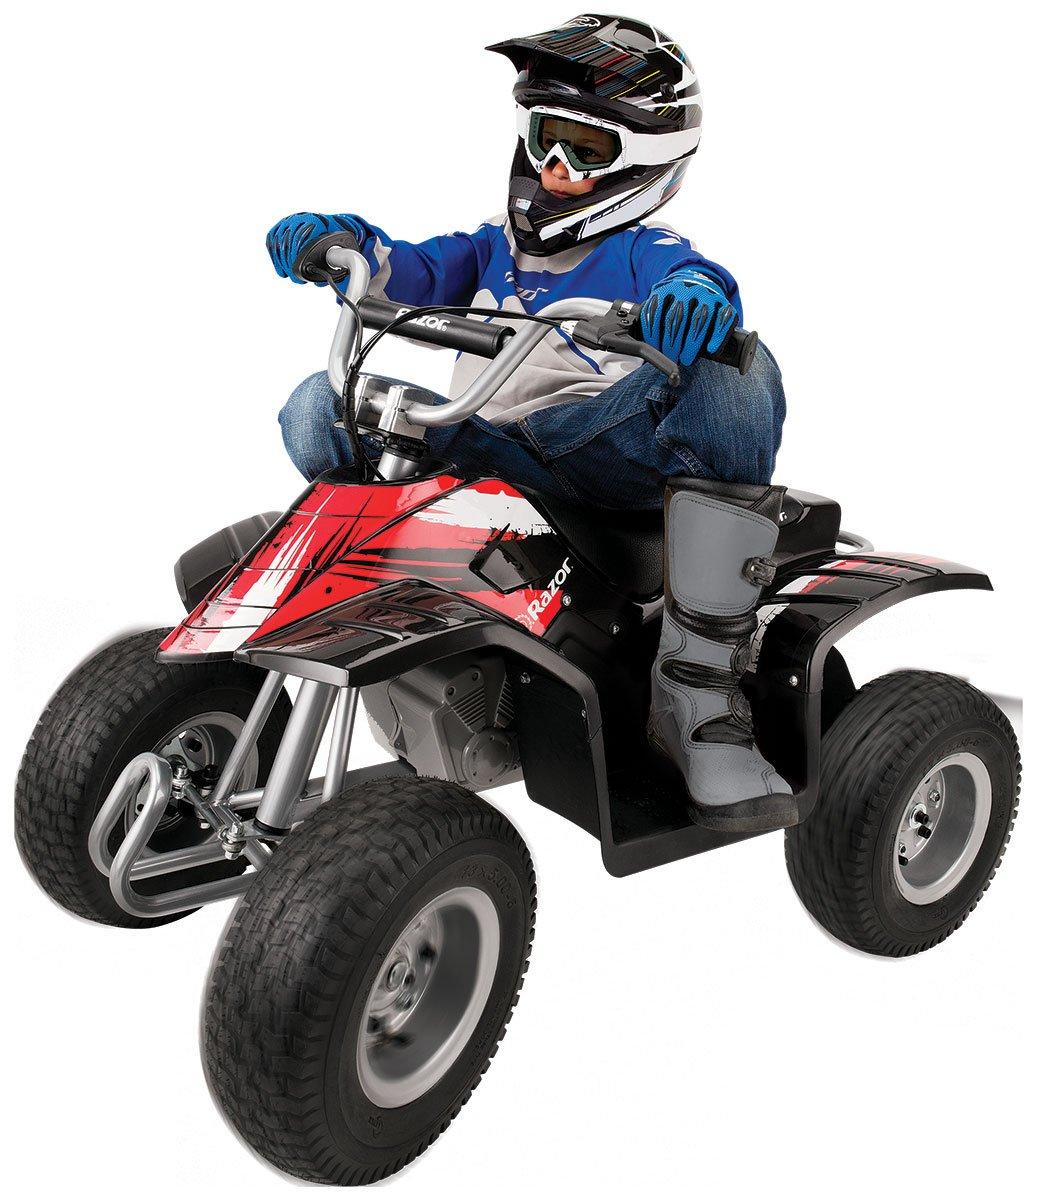 ATV Brakes Suspension